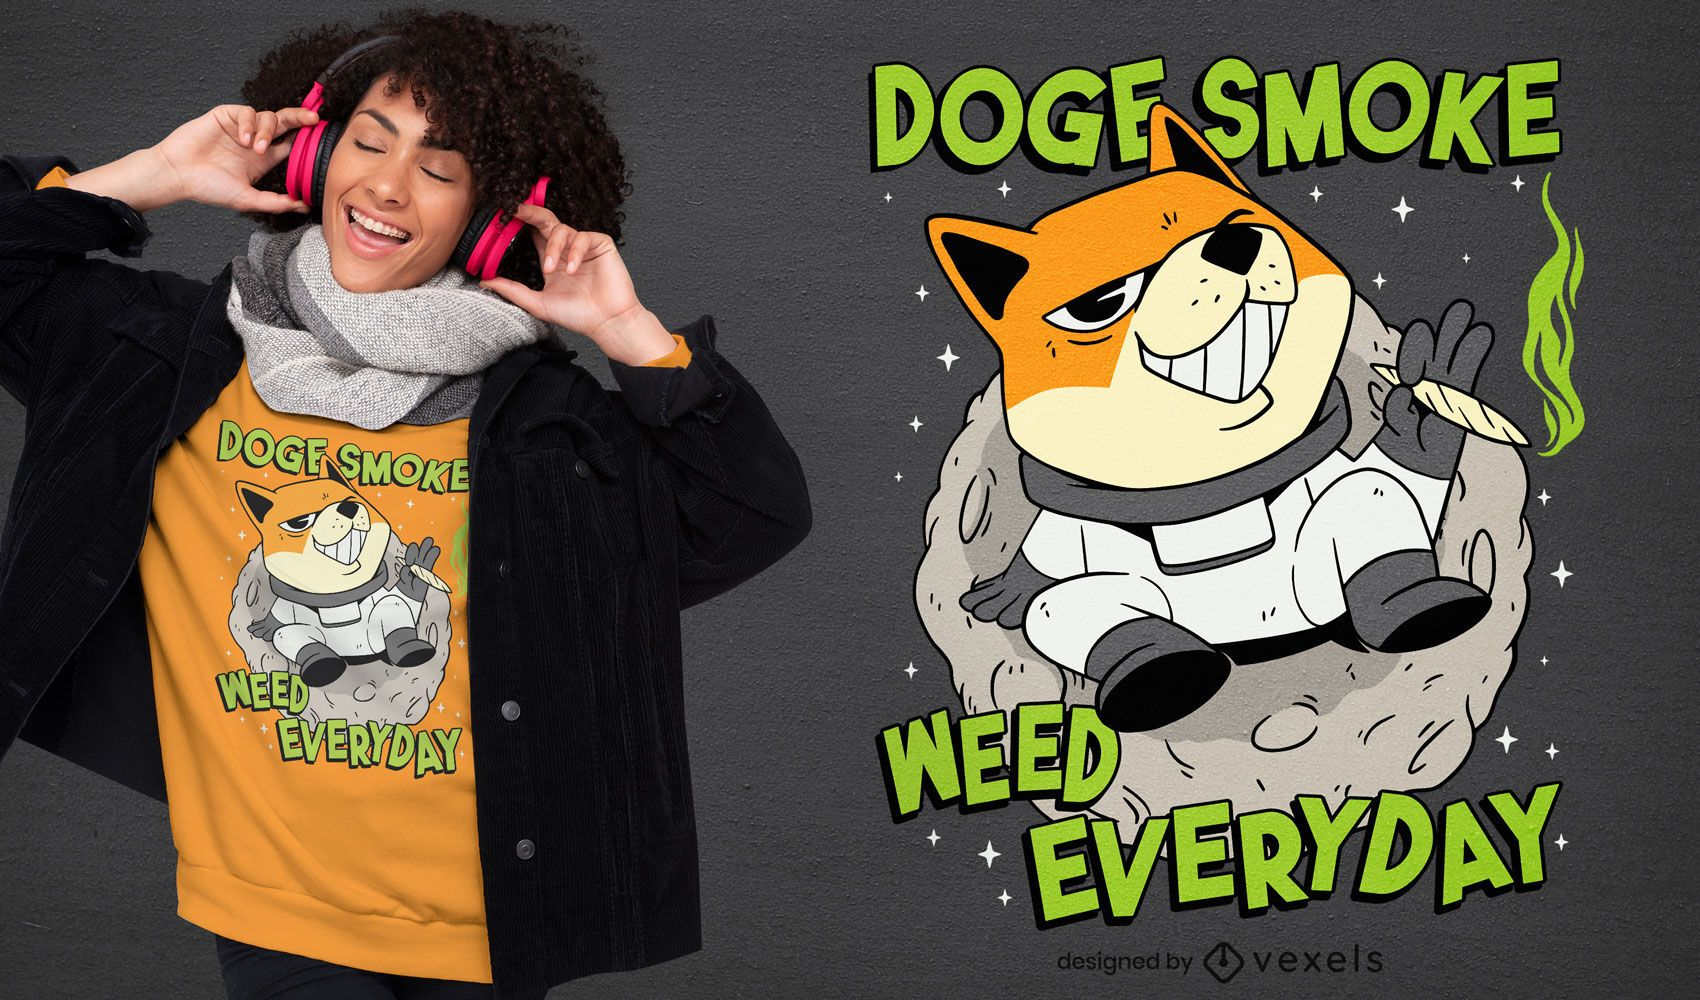 Doge smoking weed in space t-shirt design